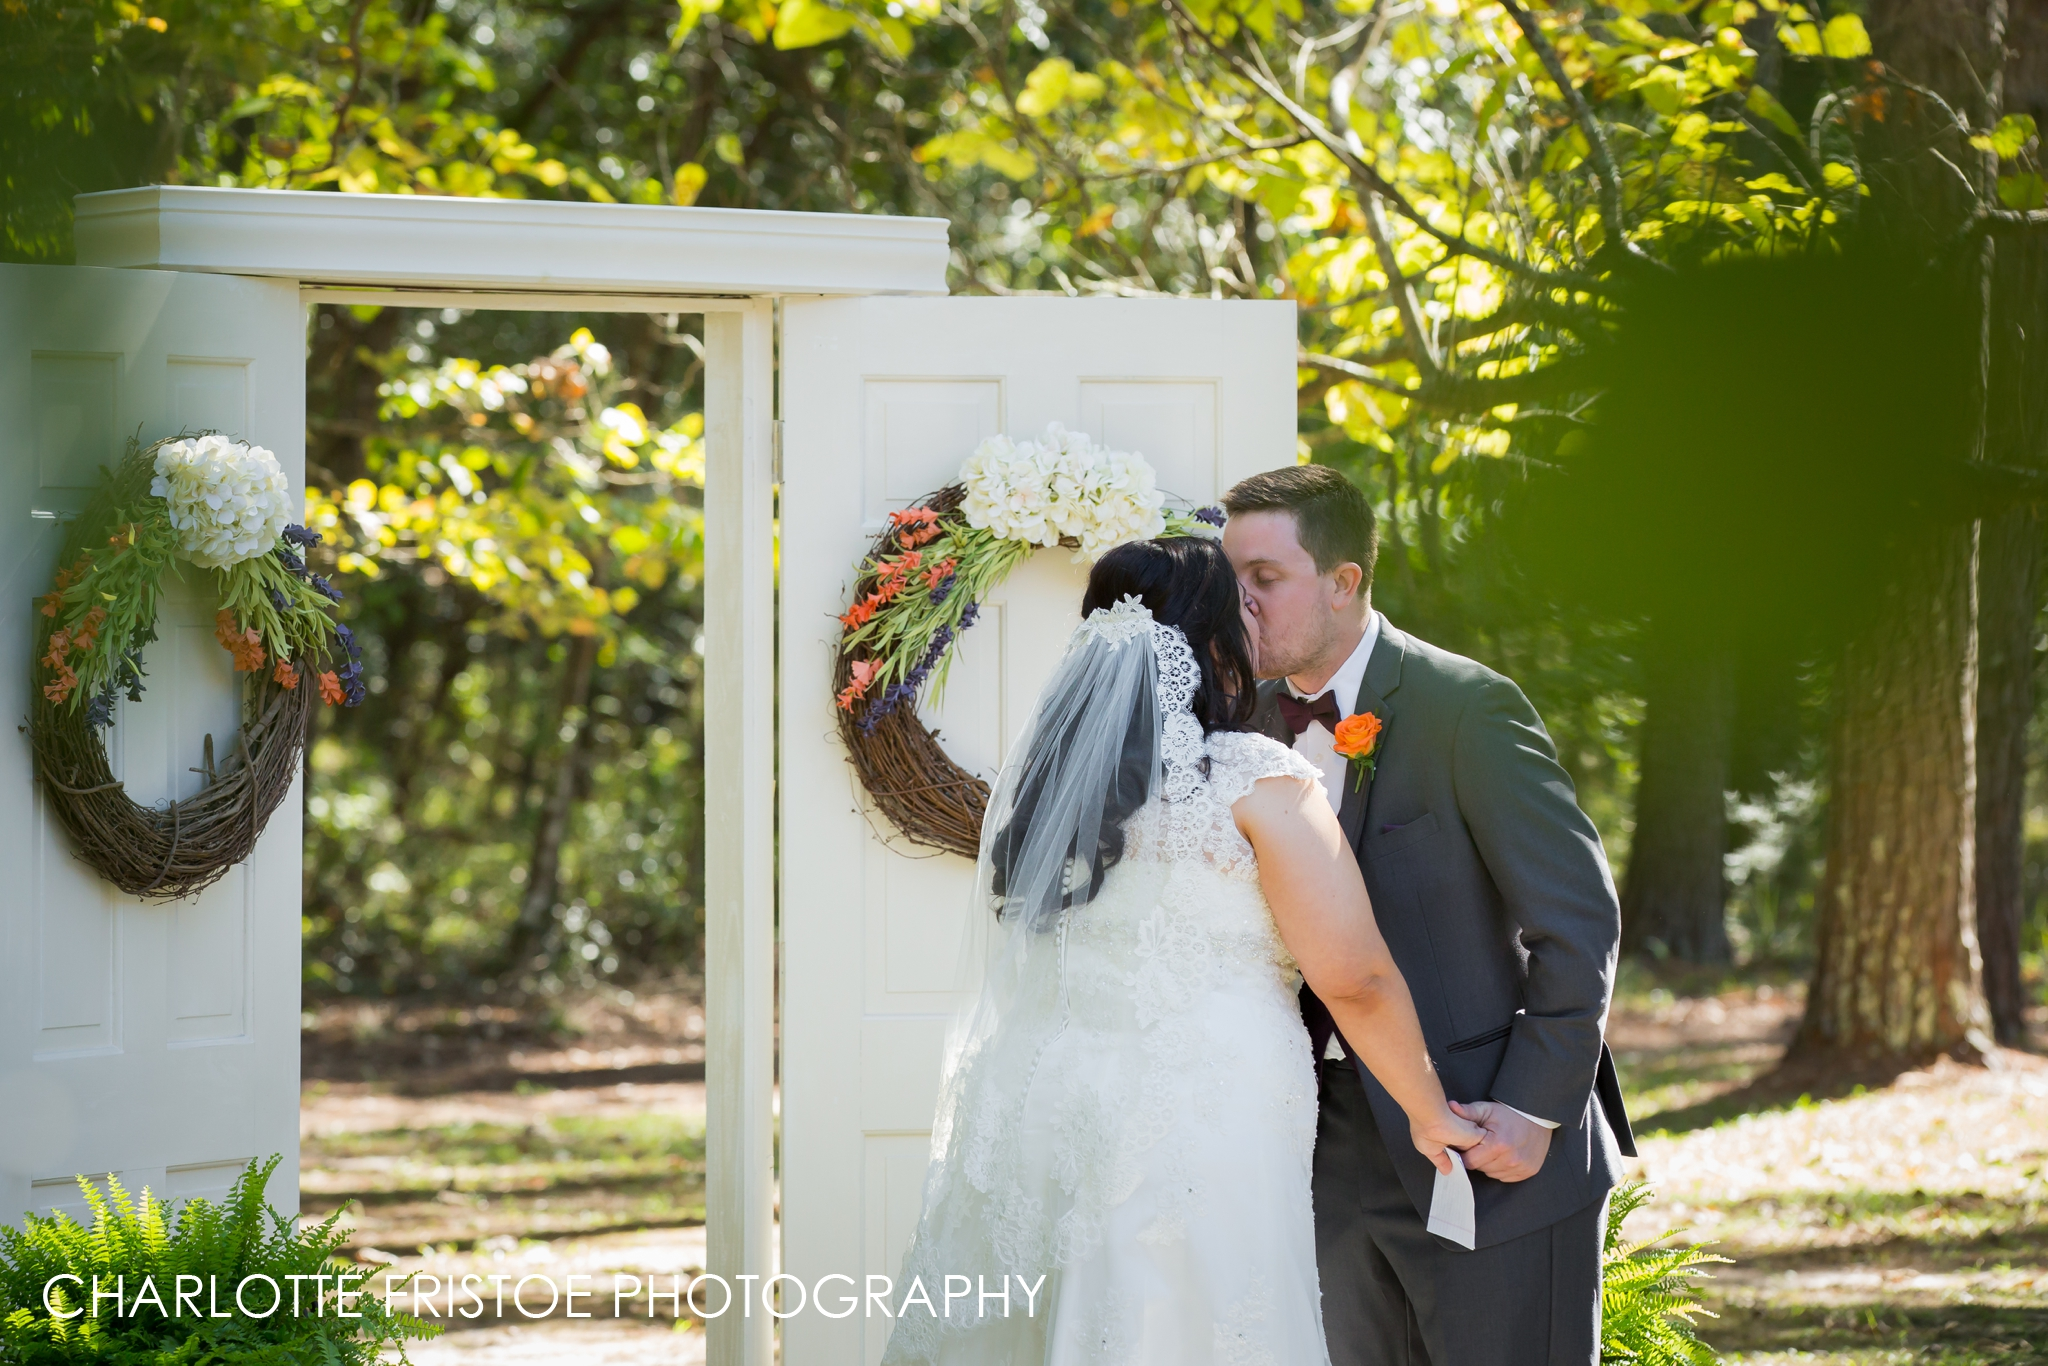 Lake Iamonia Wedding Charlotte Fristoe Photography-17.jpg